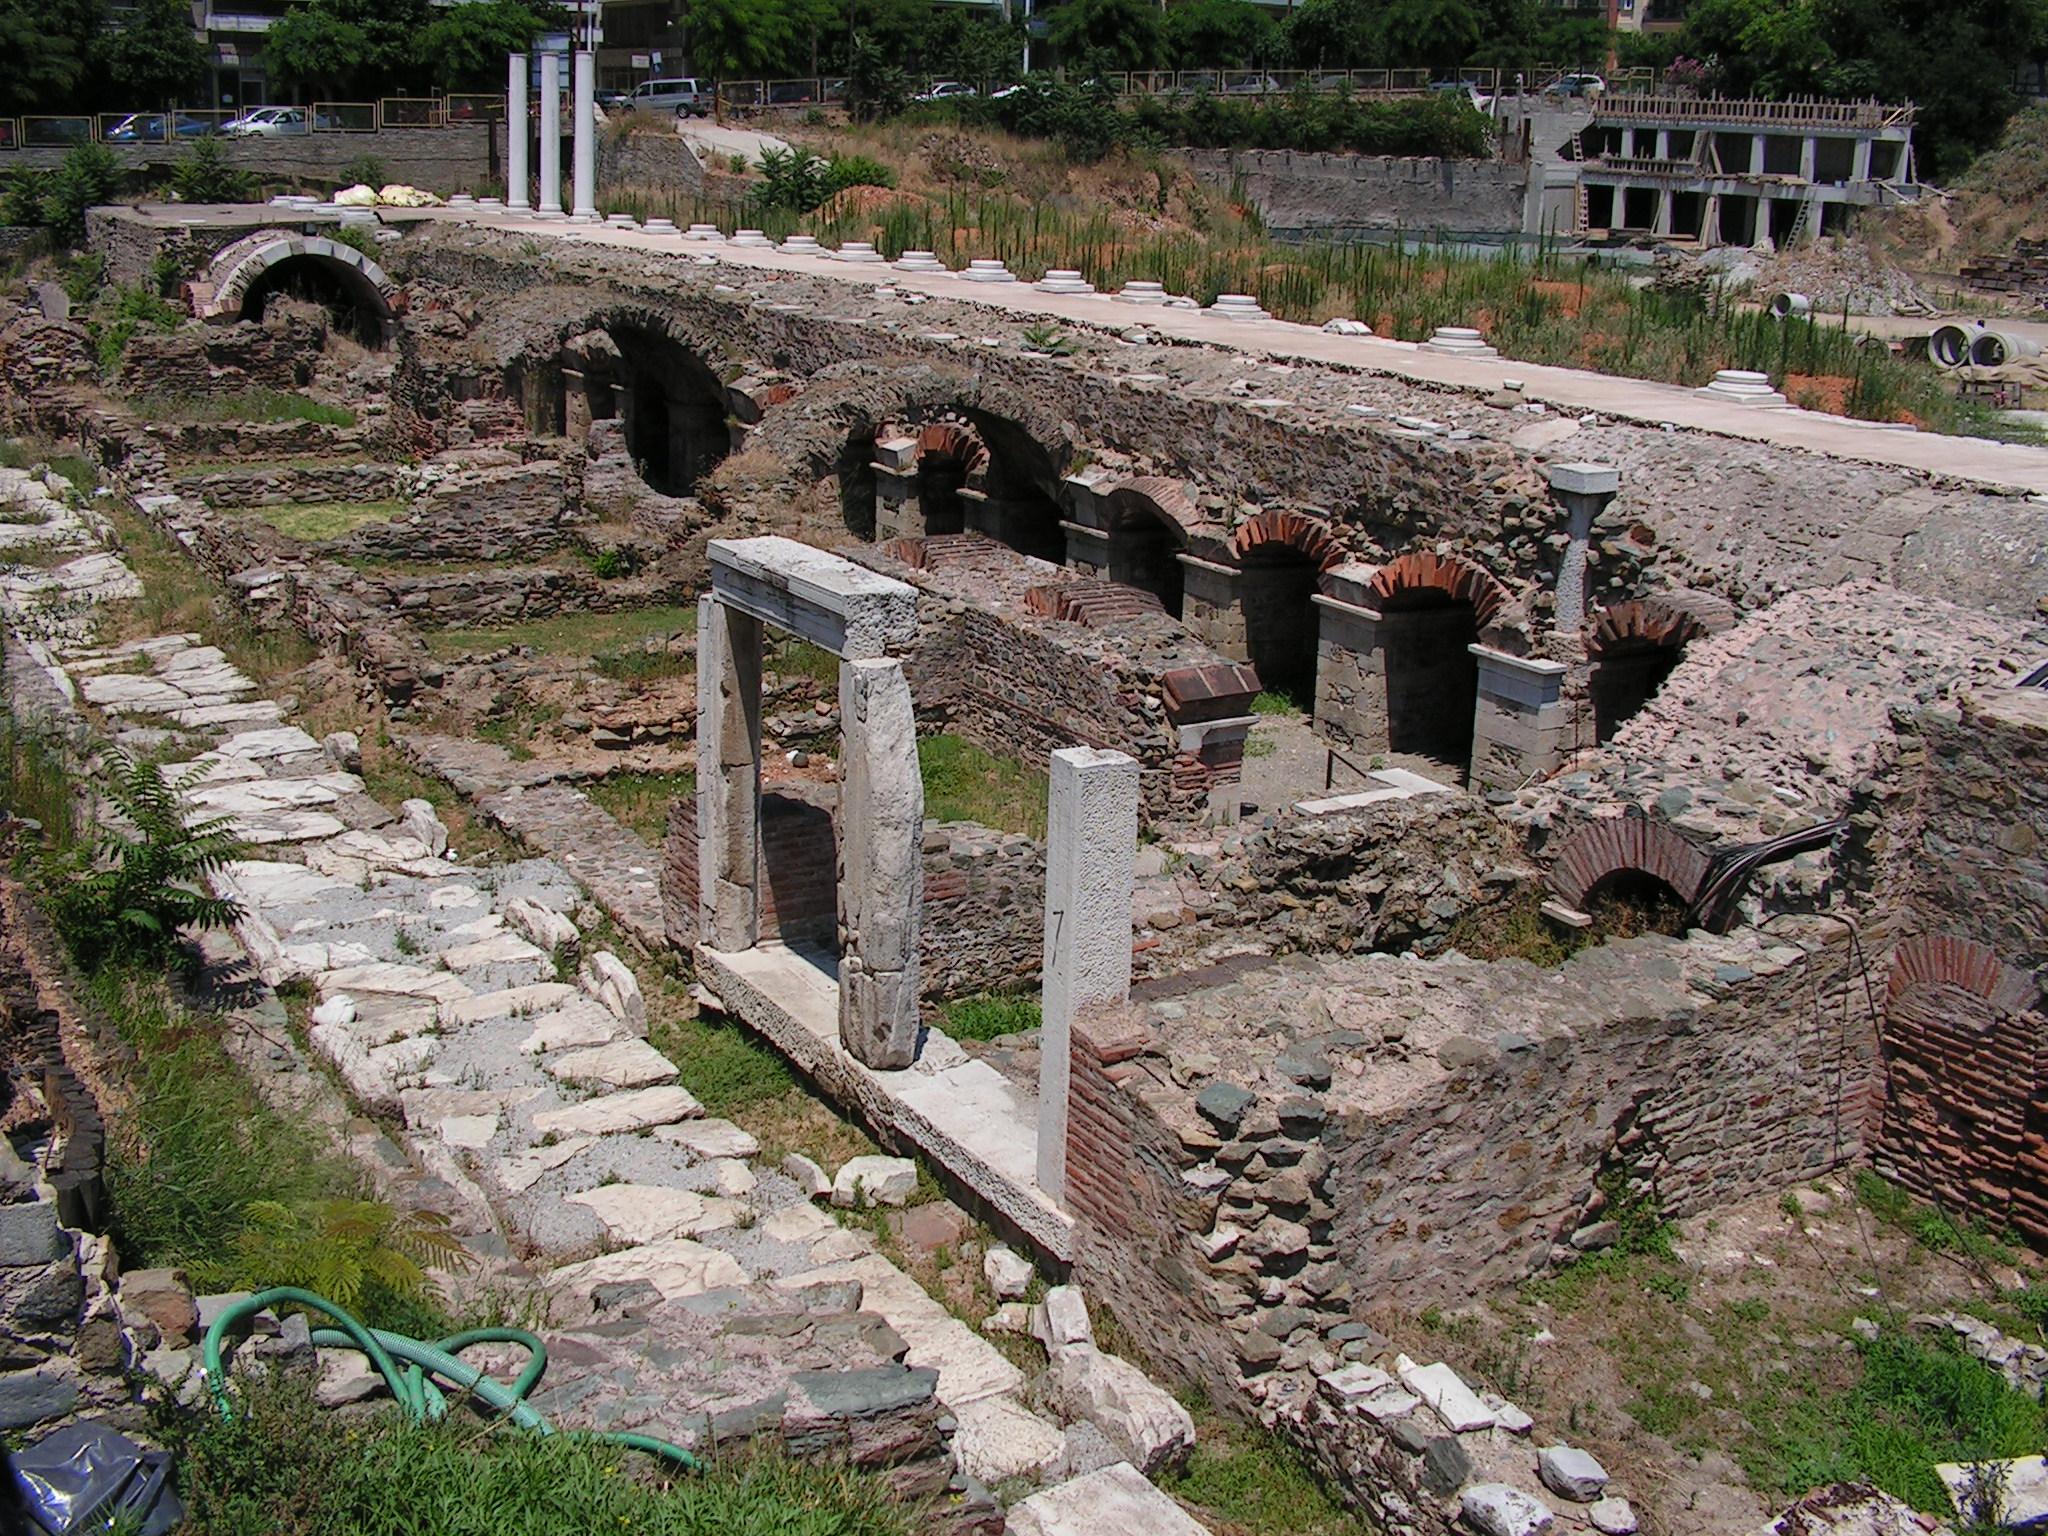 File:Thessaloniki-Ancient Agora.jpg - Wikimedia Commons